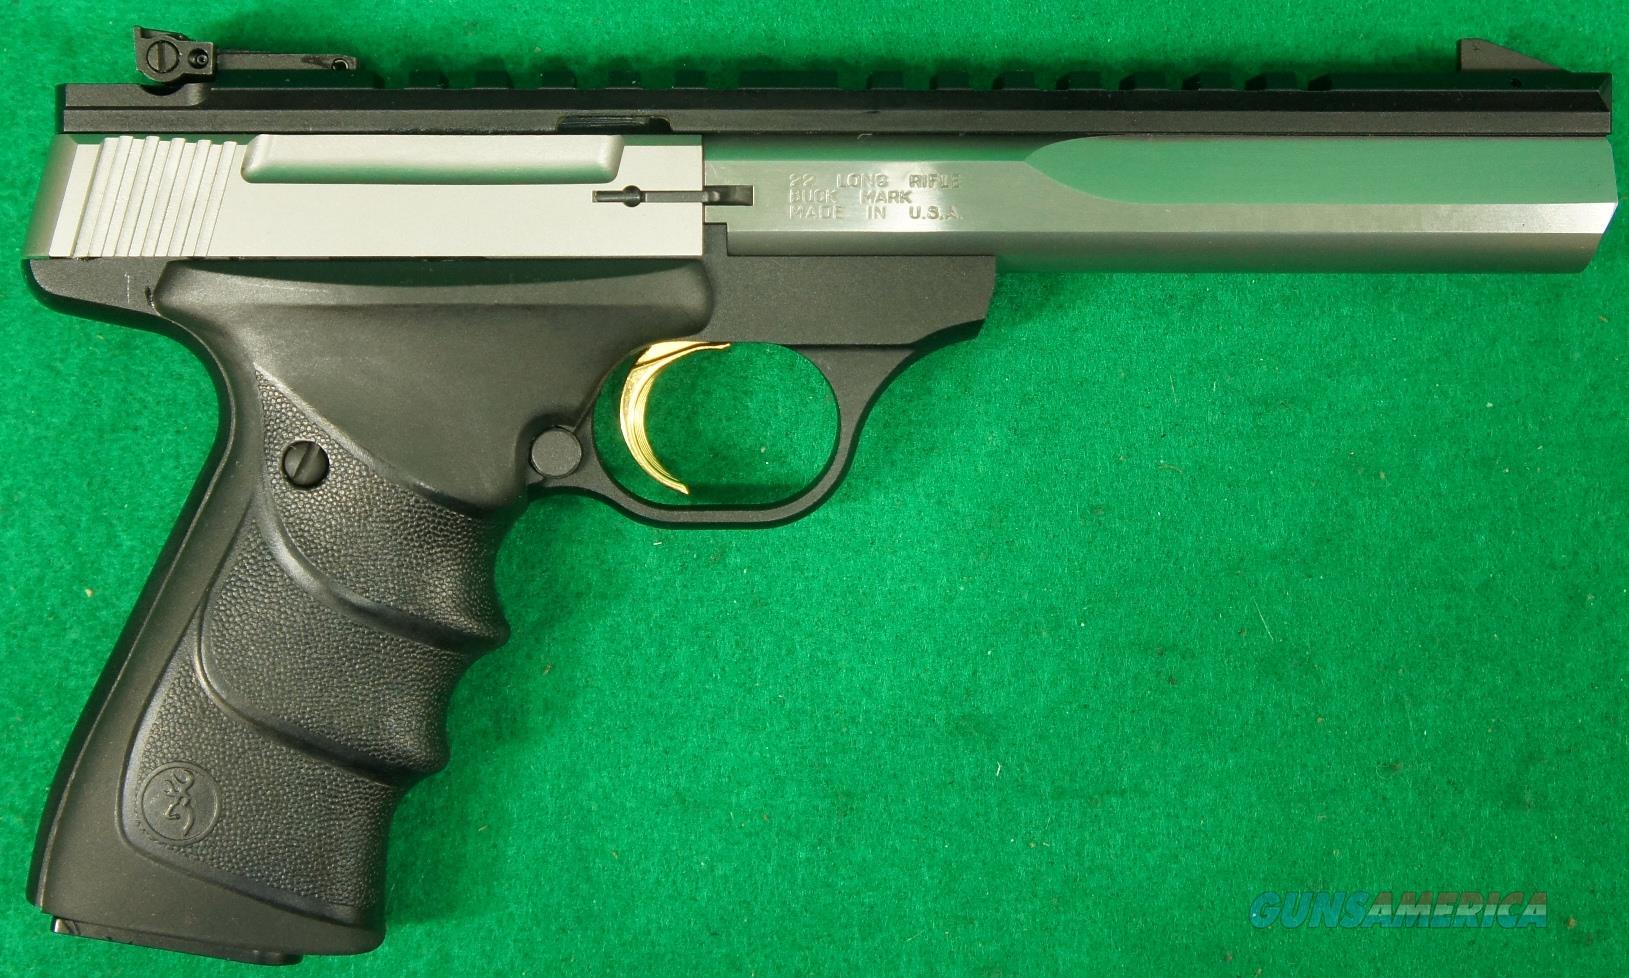 Buck Mark Contour SS URX 22LR 5.5In 051507490  Guns > Pistols > Browning Pistols > Buckmark